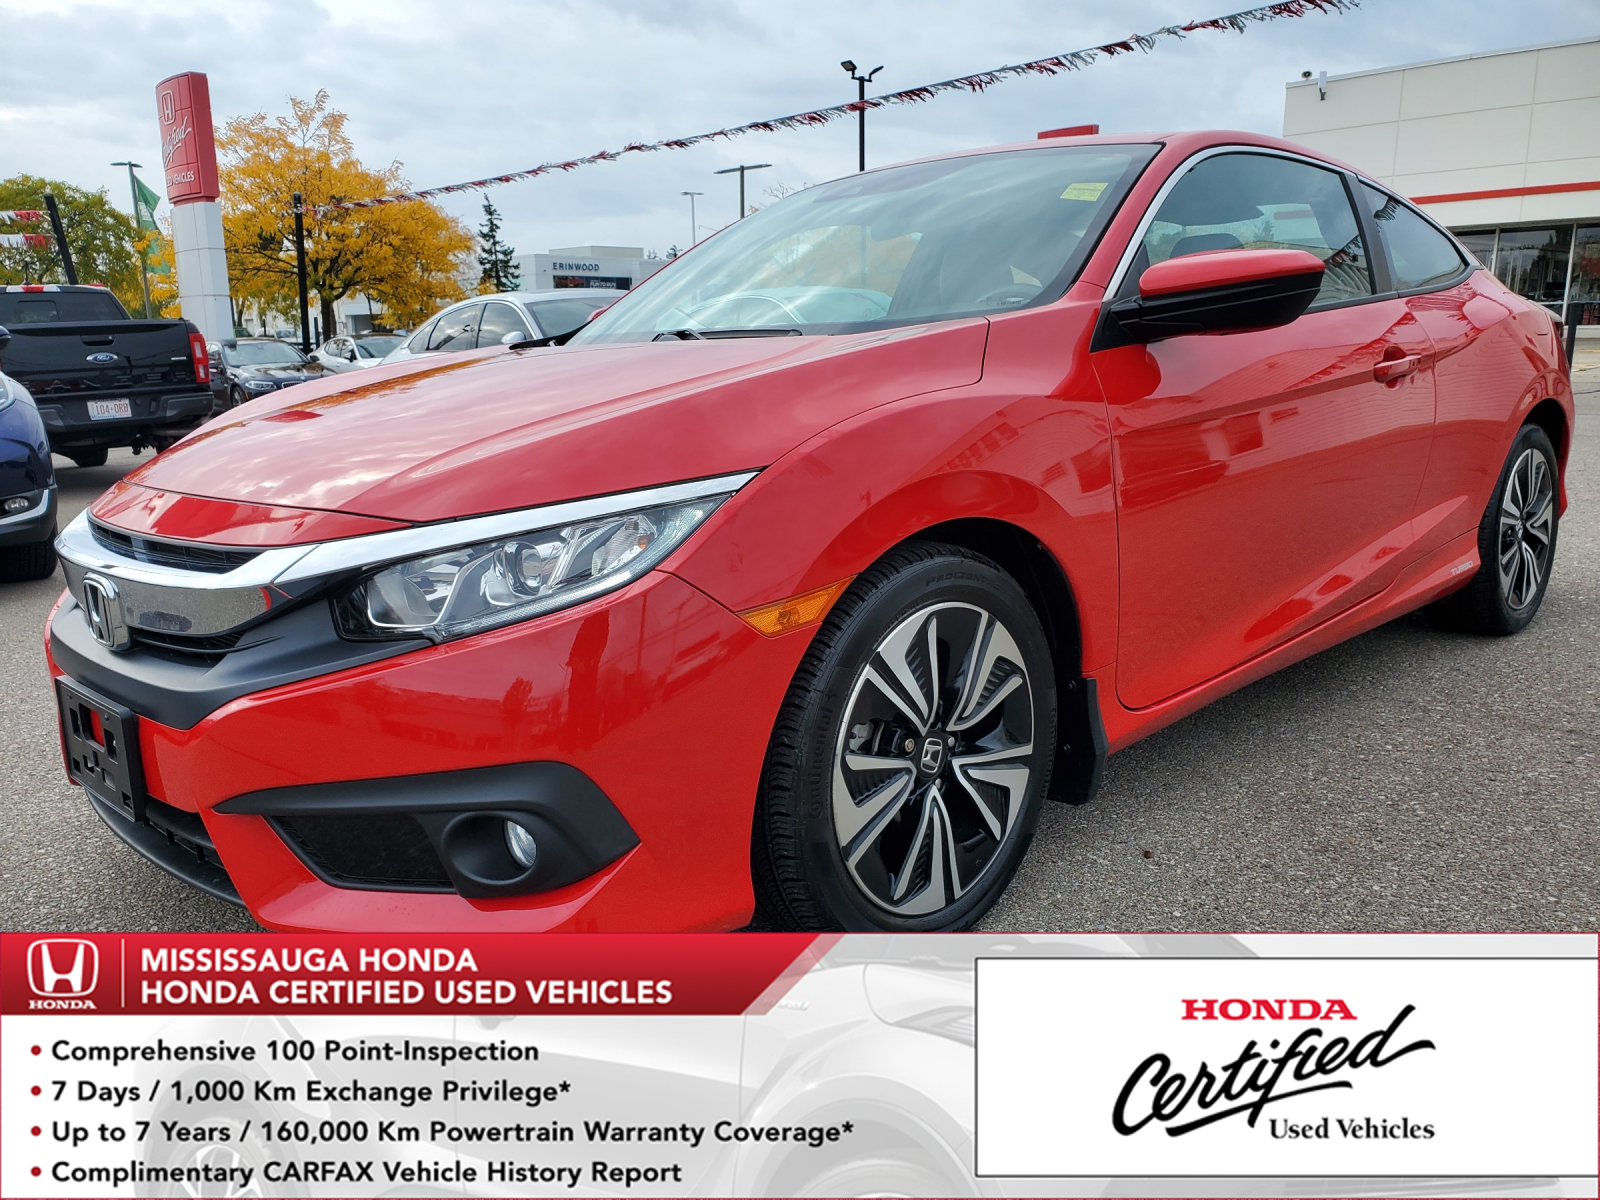 2017 Honda Civic Image